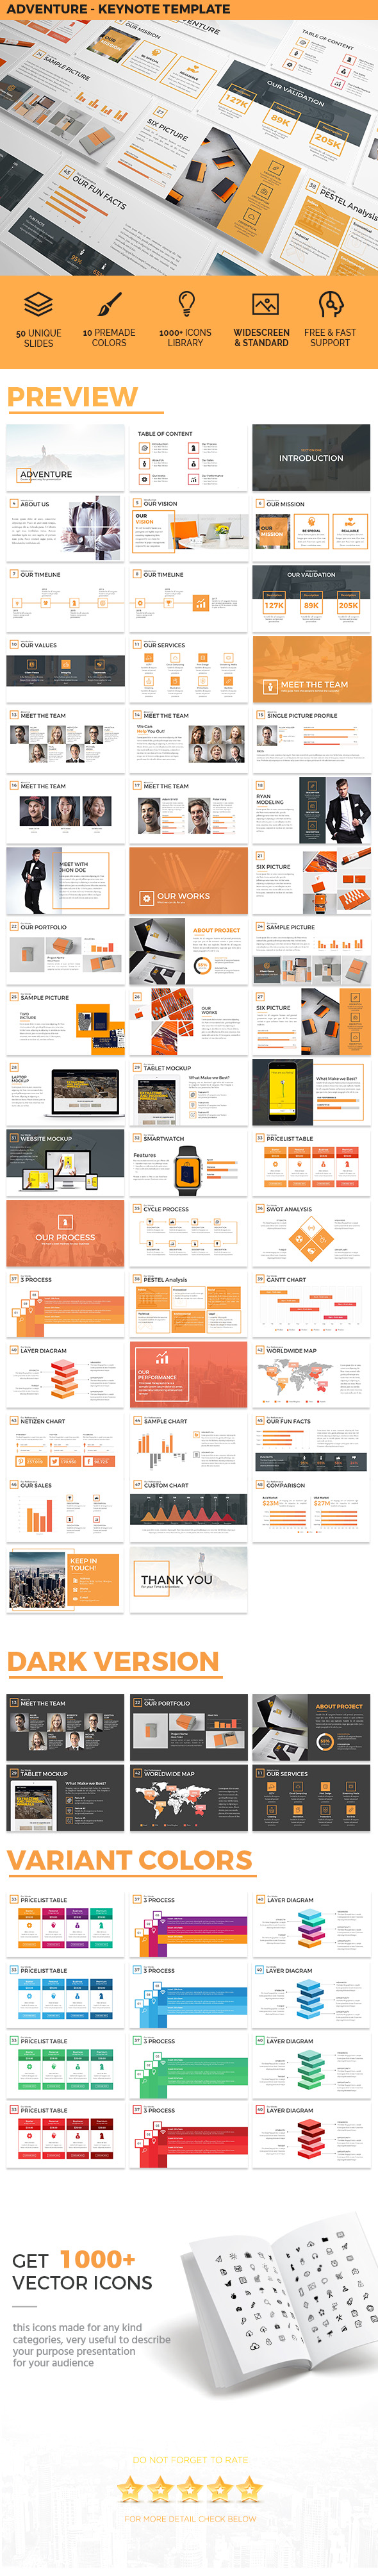 Adventure - Keynote Template Presentation - Business Keynote Templates